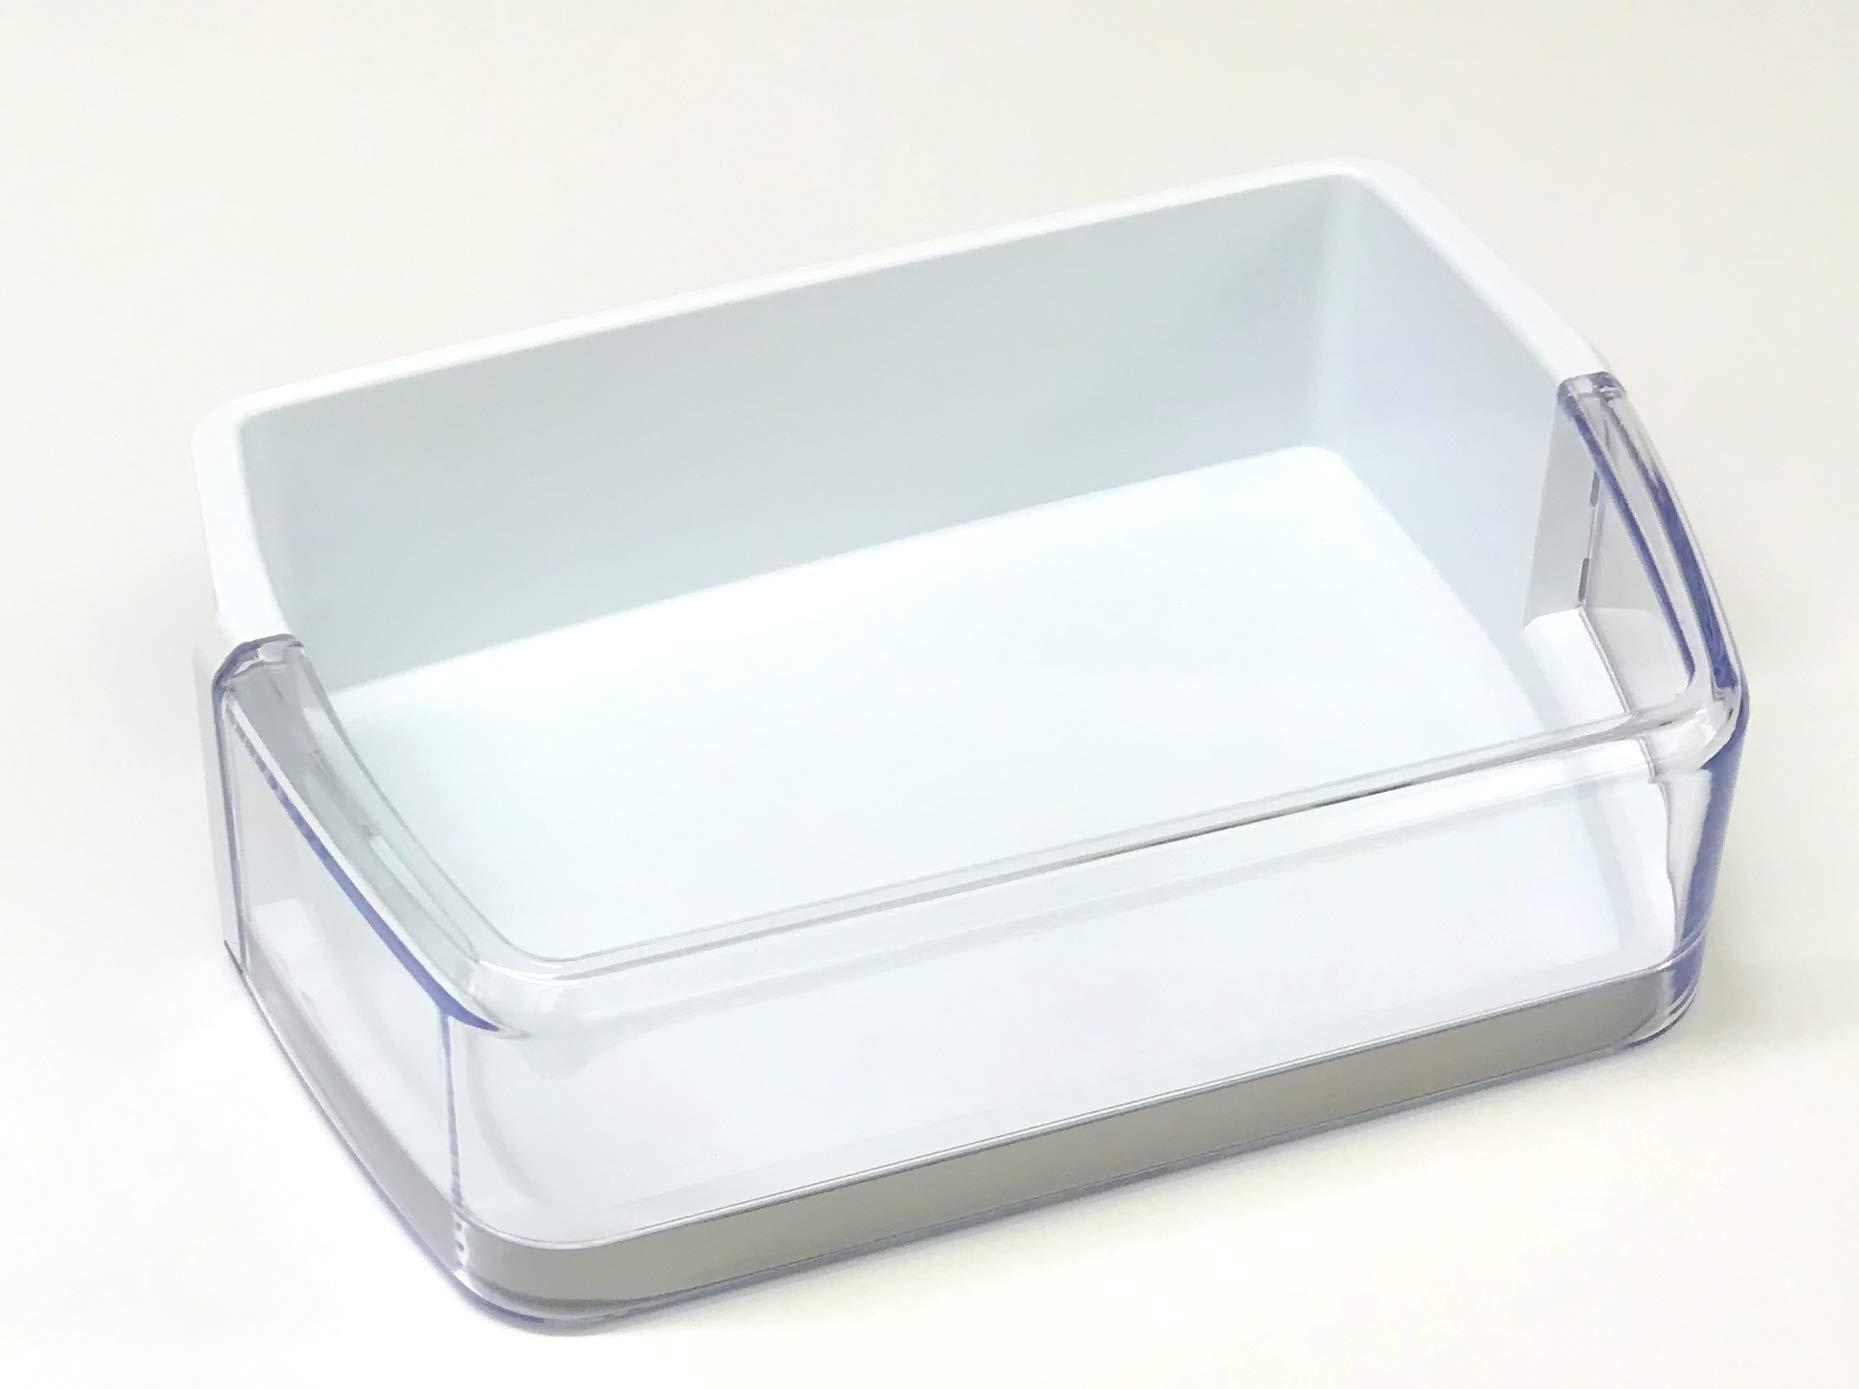 OEM Samsung Refrigerator Door Bin Basket Shelf Tray RF4287HARS, RF4287HARS/XAA, RF4287HARS/XAC, RF4289HARS, RF4289HARS/XAA by Samsung